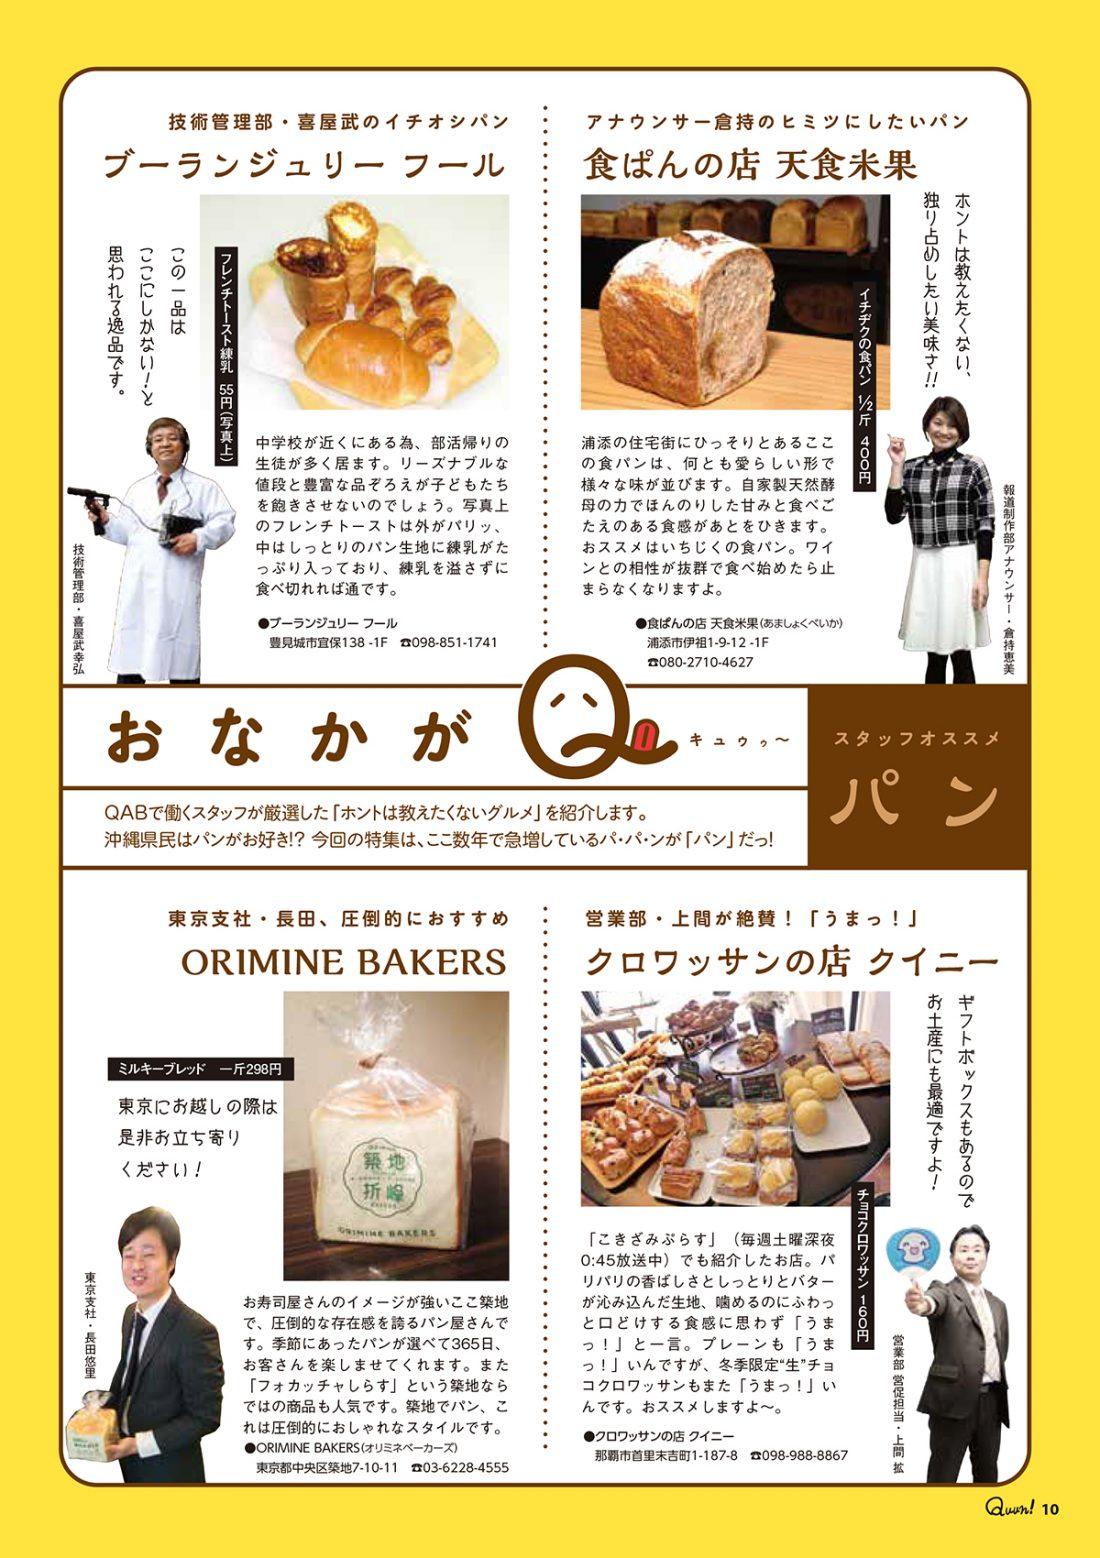 https://www.qab.co.jp/qgoro/wp-content/uploads/quun_0312-1100x1558.jpg